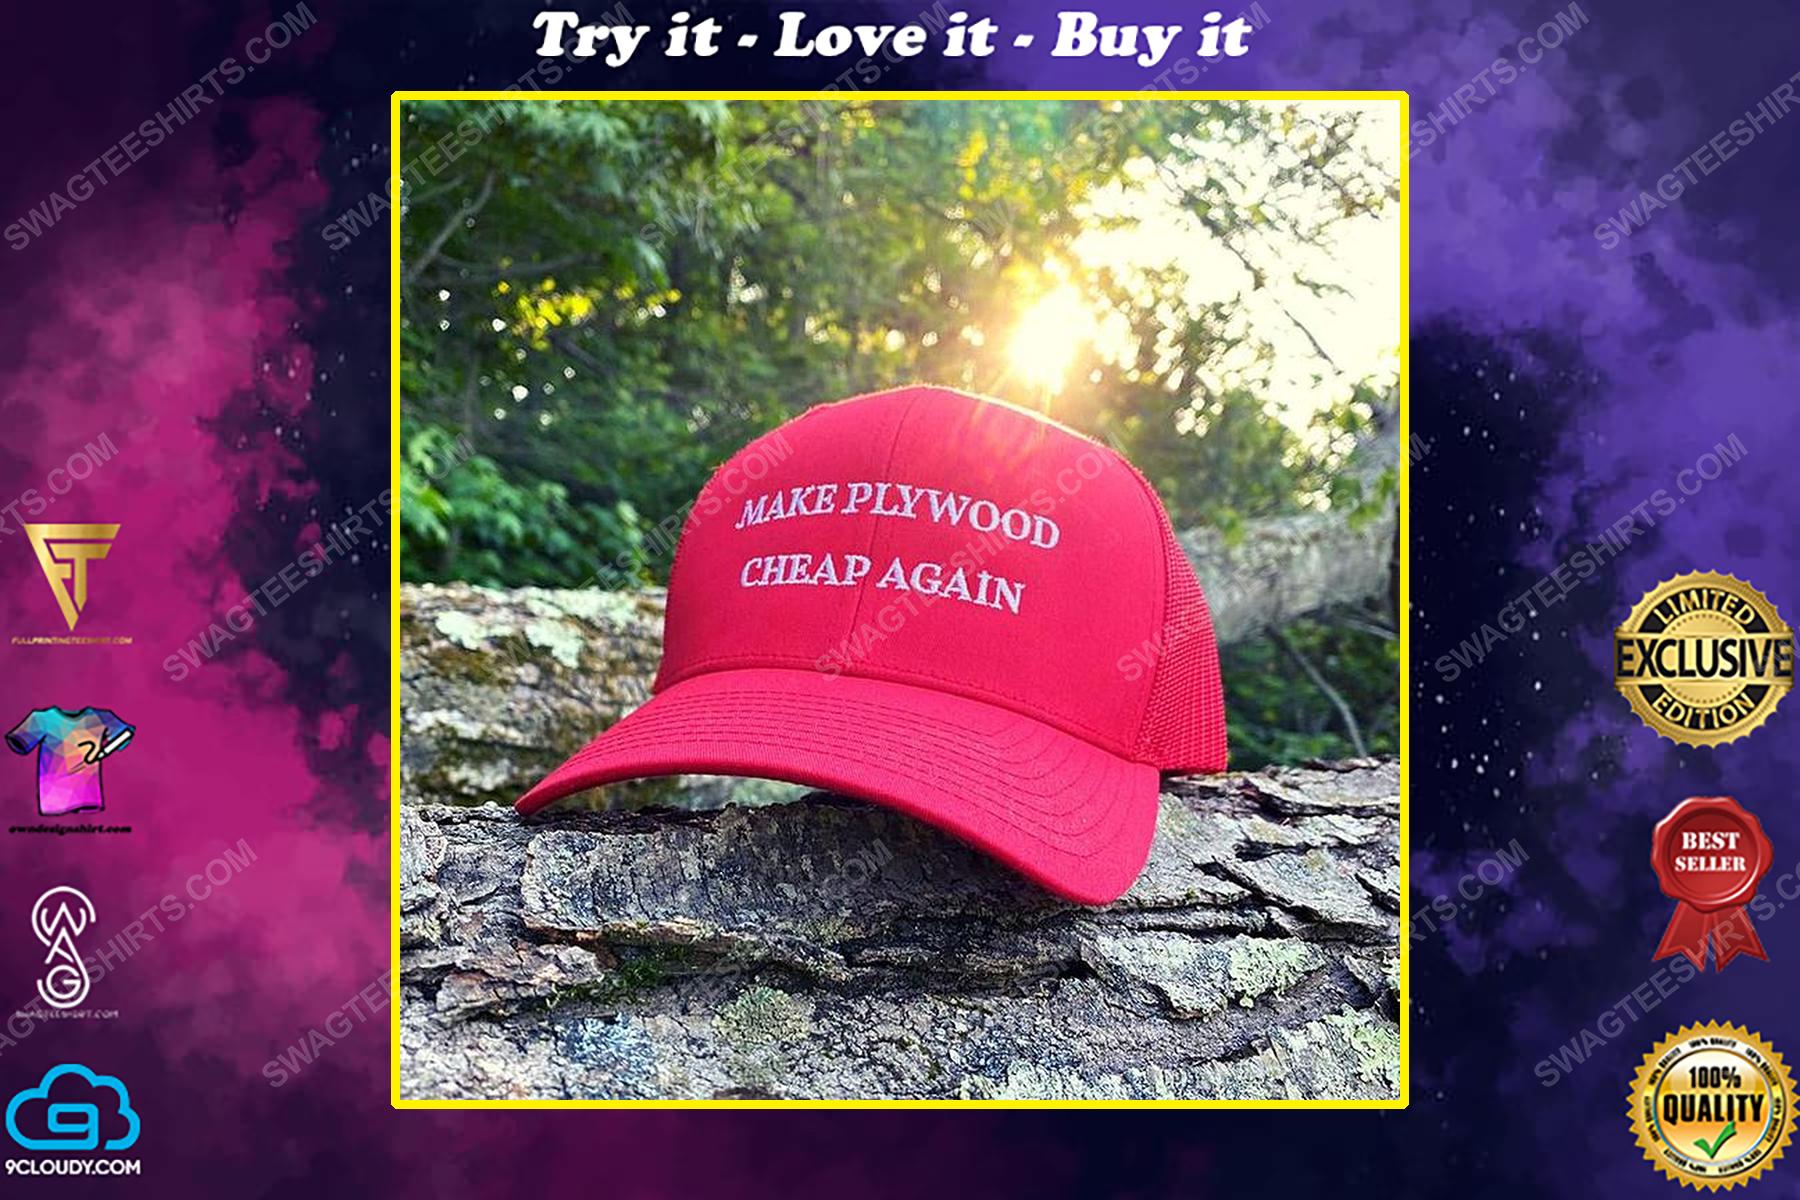 Make plywood cheap again full print classic hat